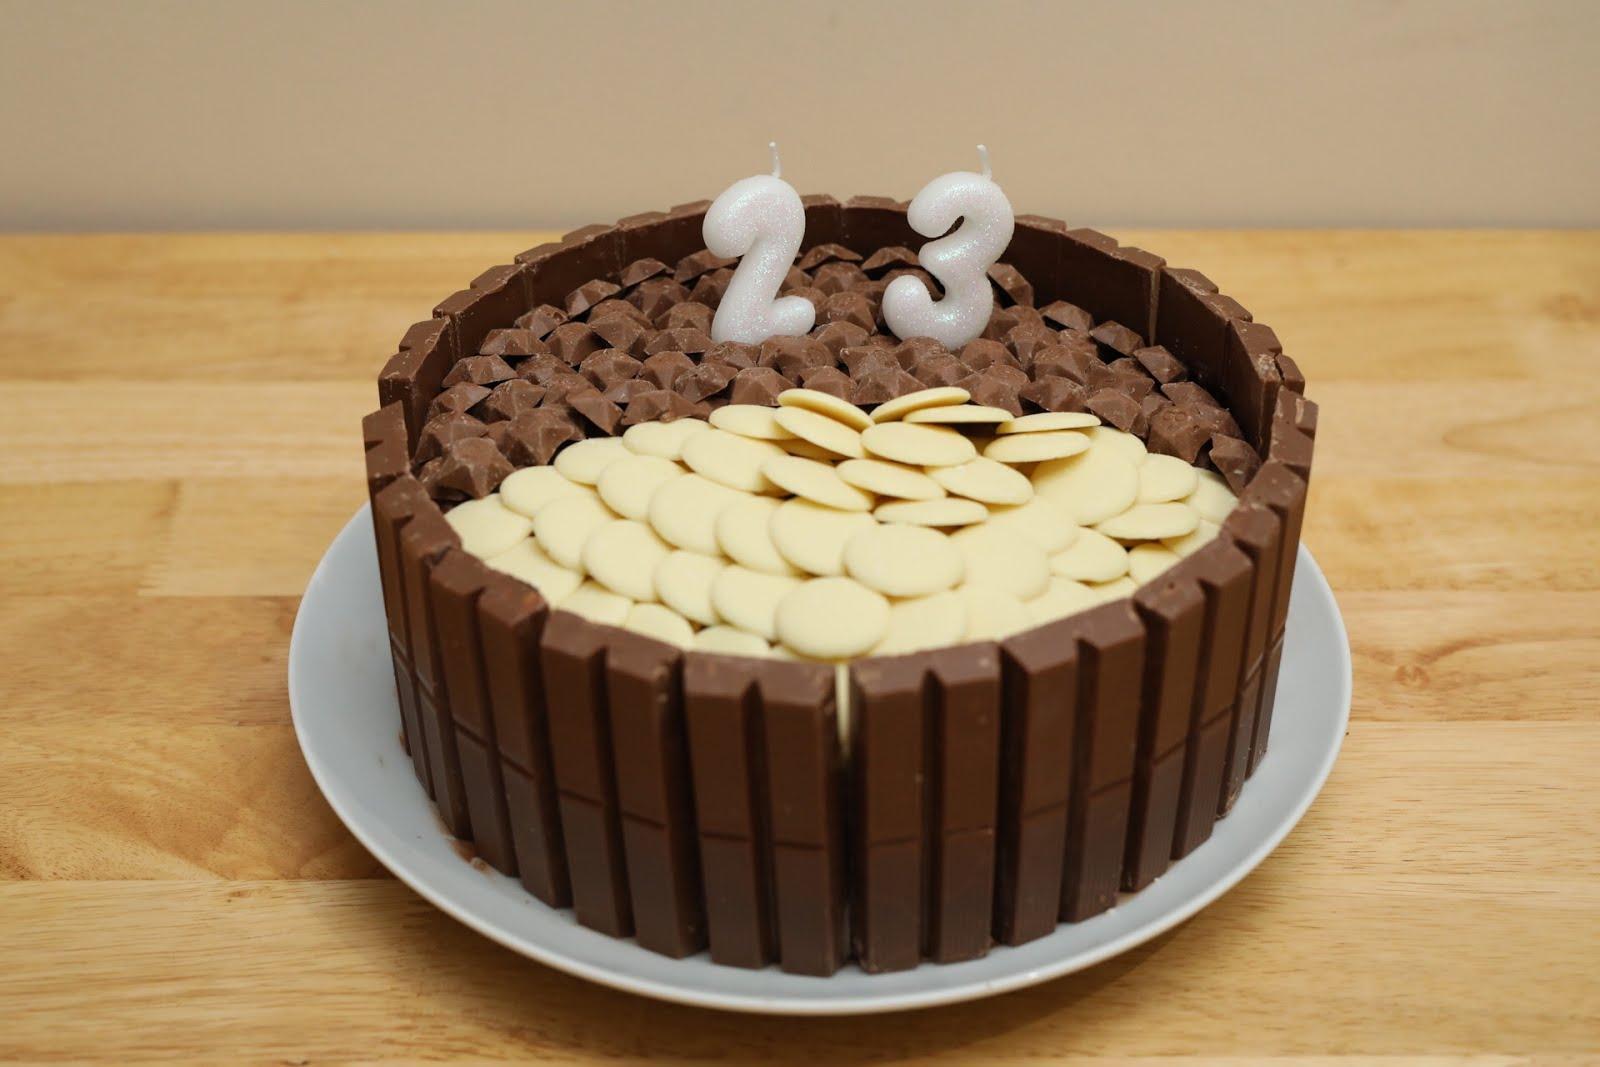 Hannahs Gluten Free Birthday Cake Using Betty Crocker Gluten Free Mix